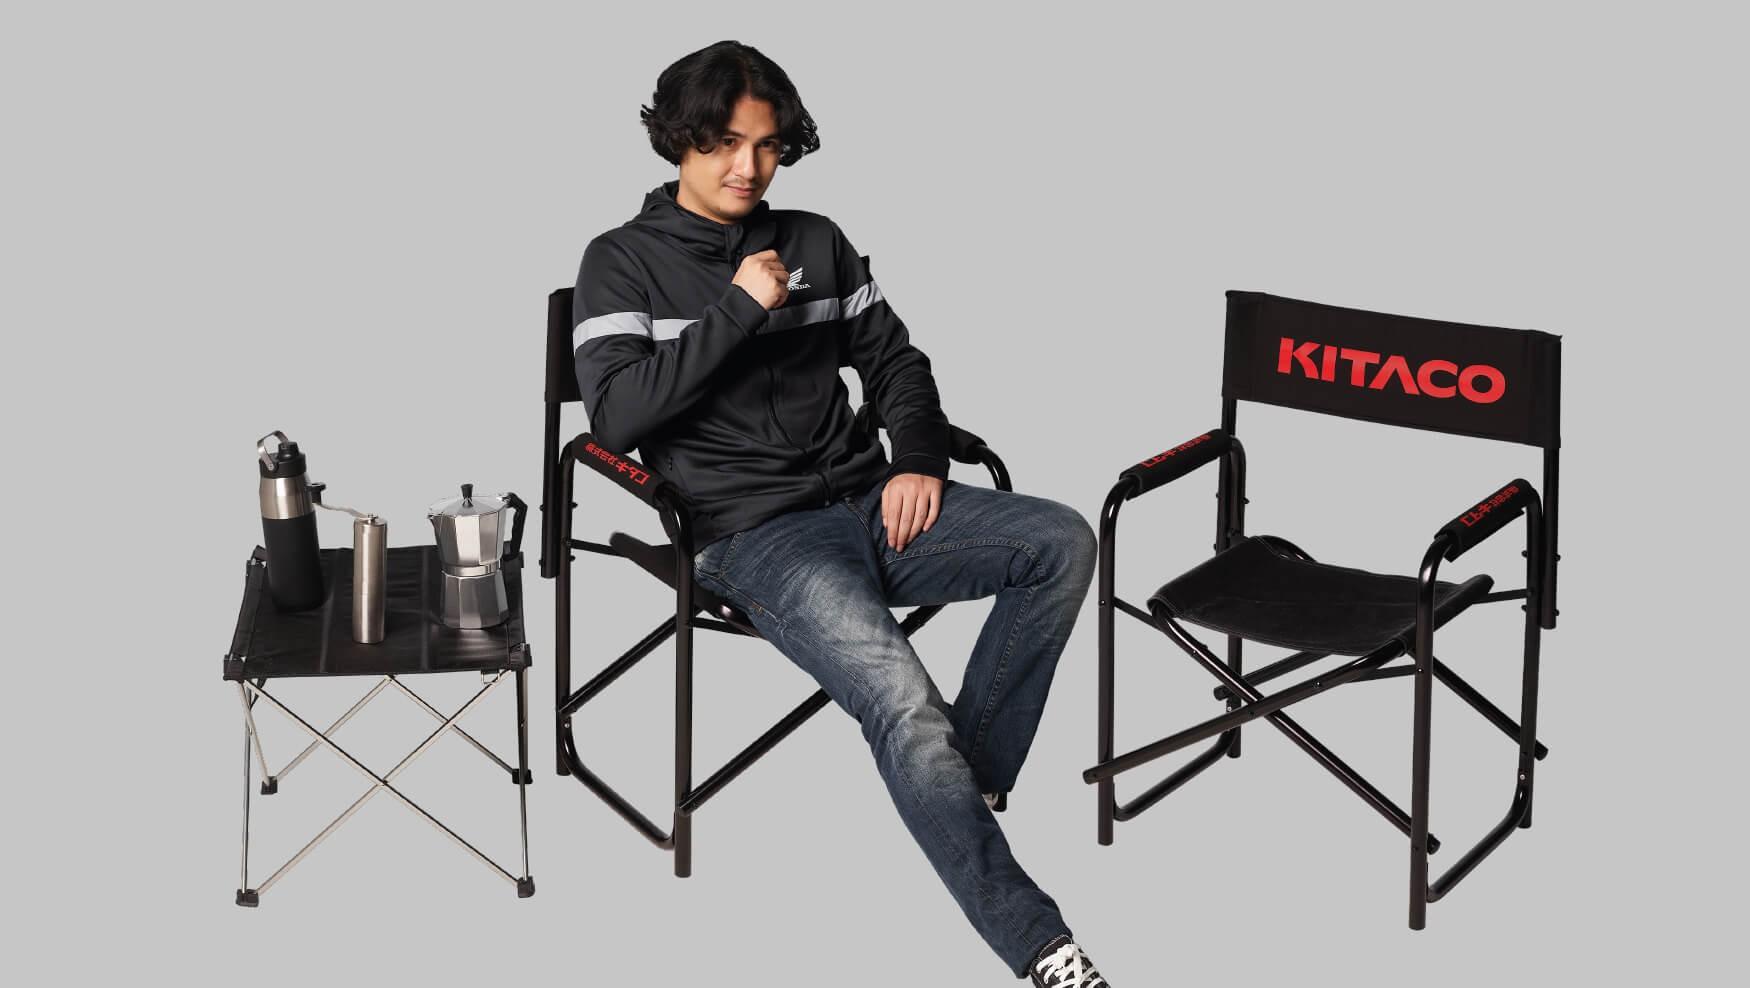 honda-kitaco-chair